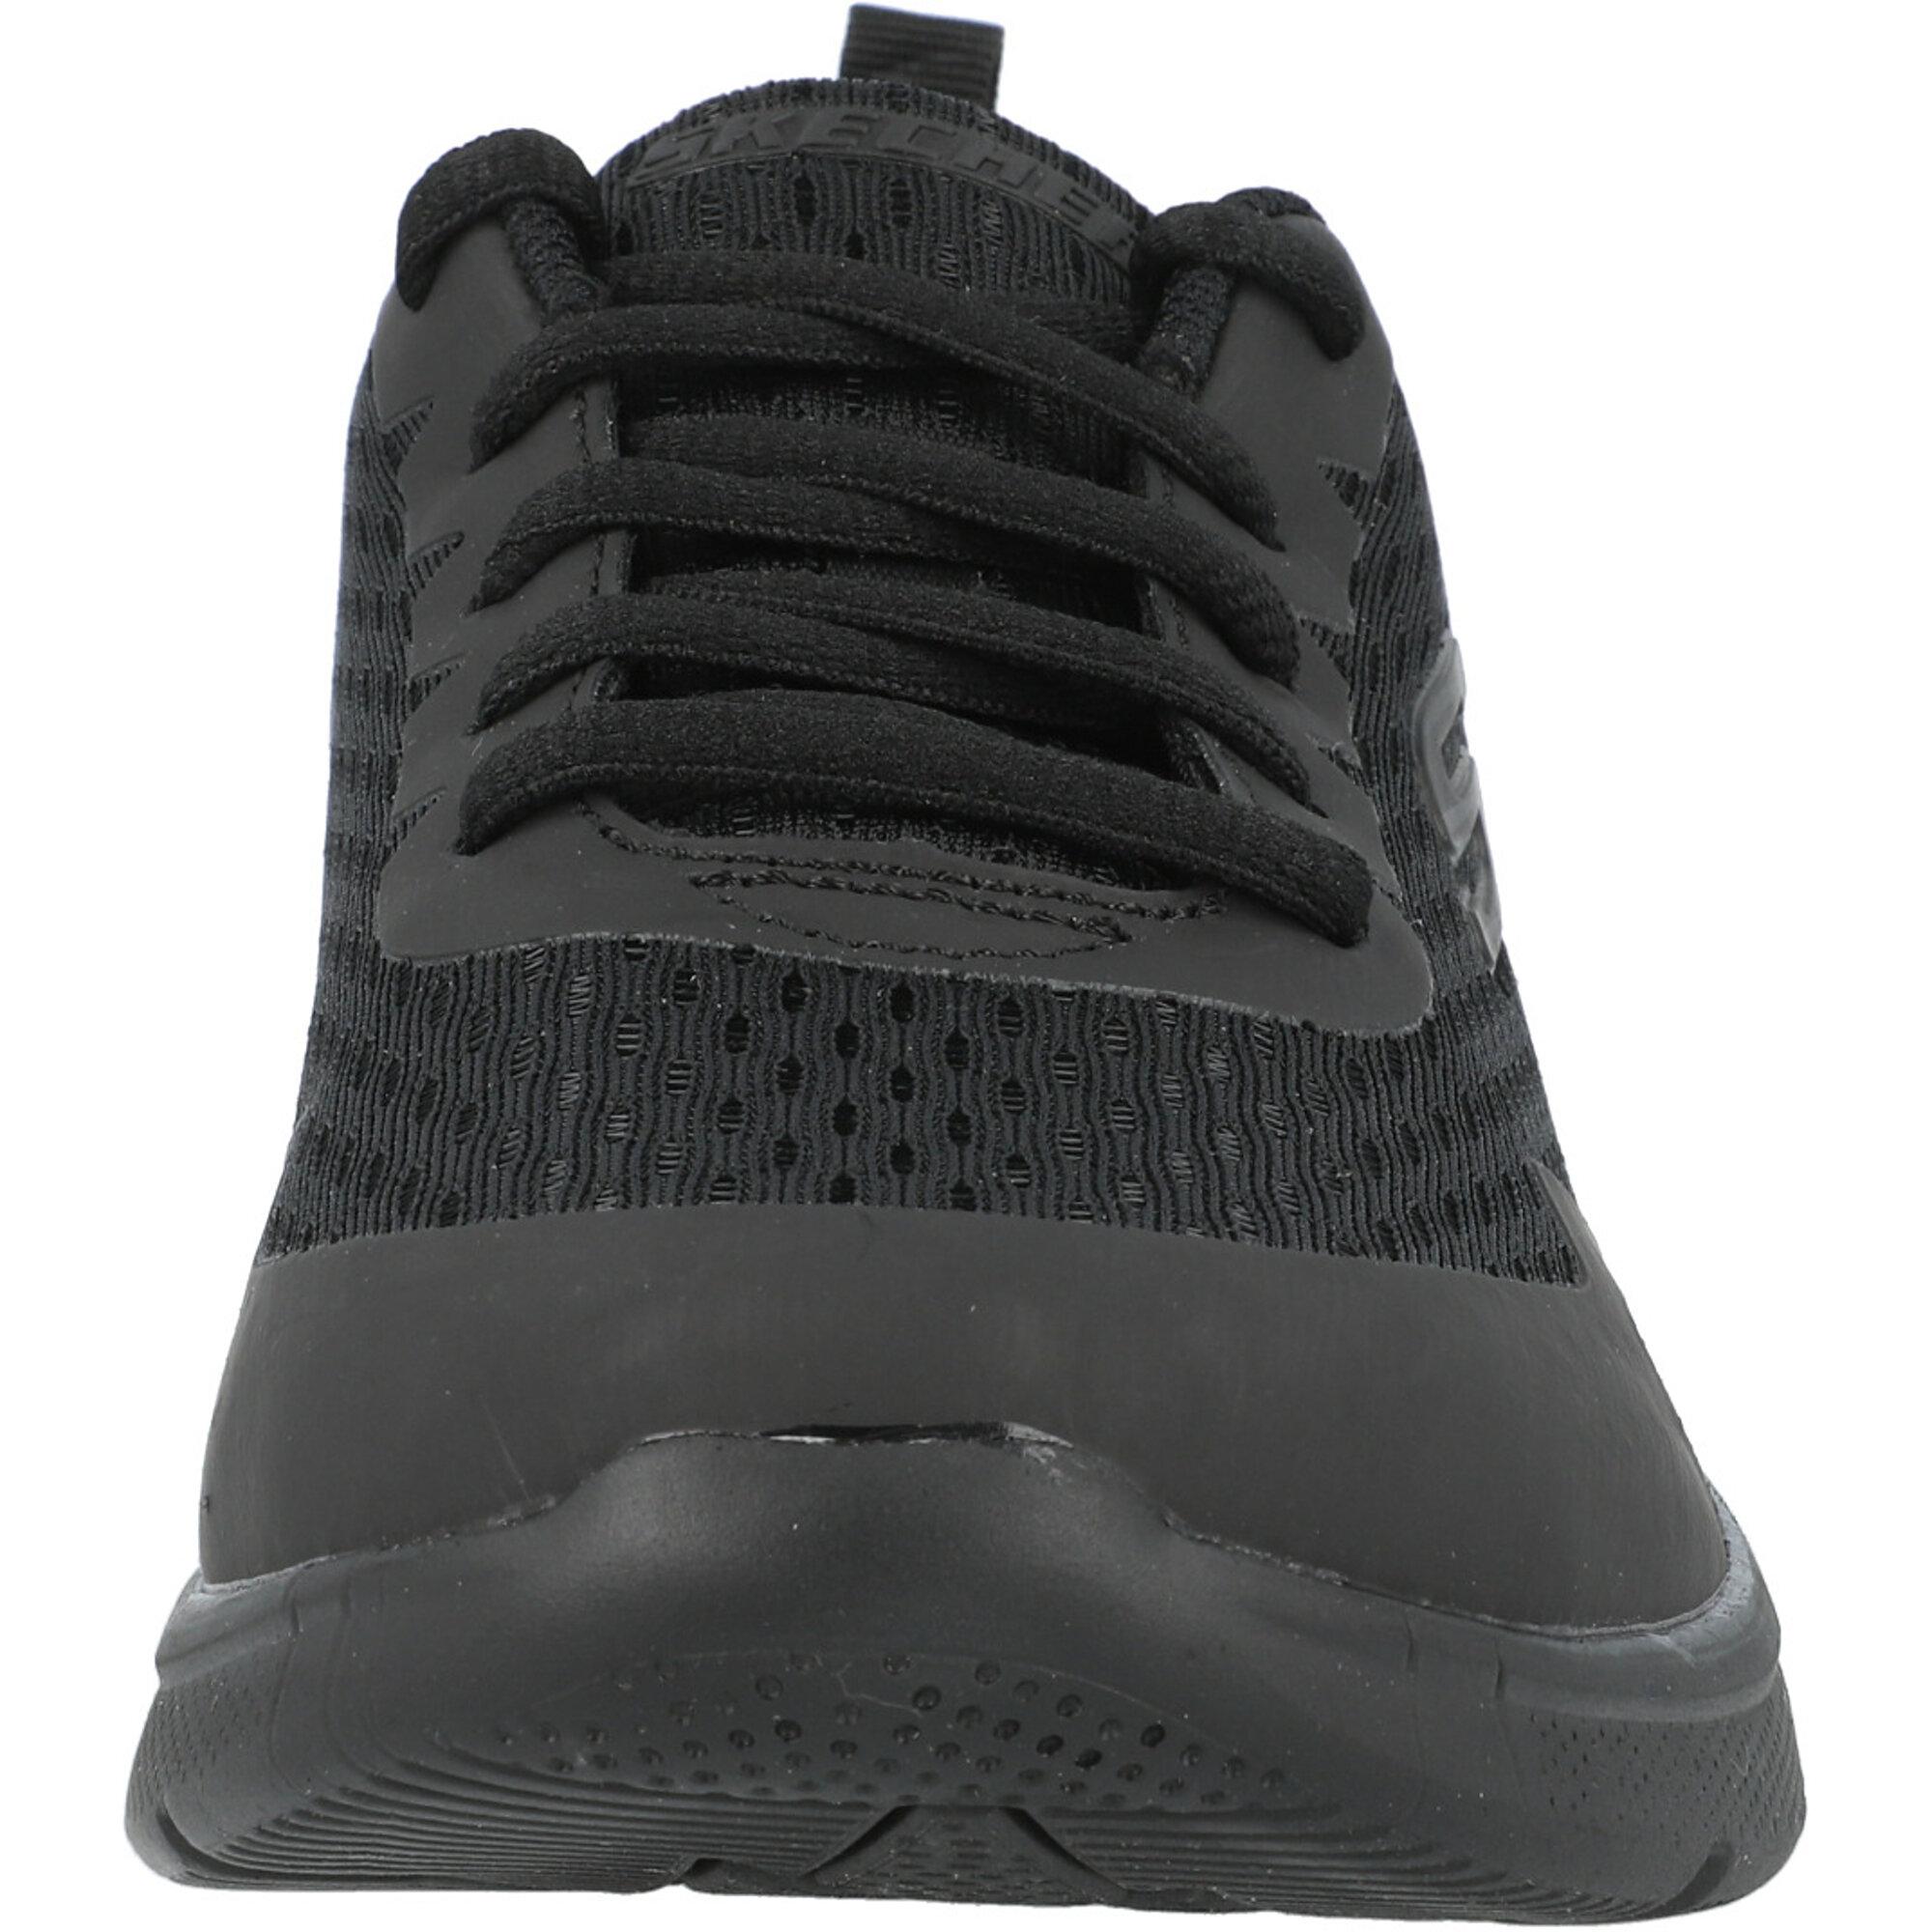 Skechers Microspec Max Black Textile